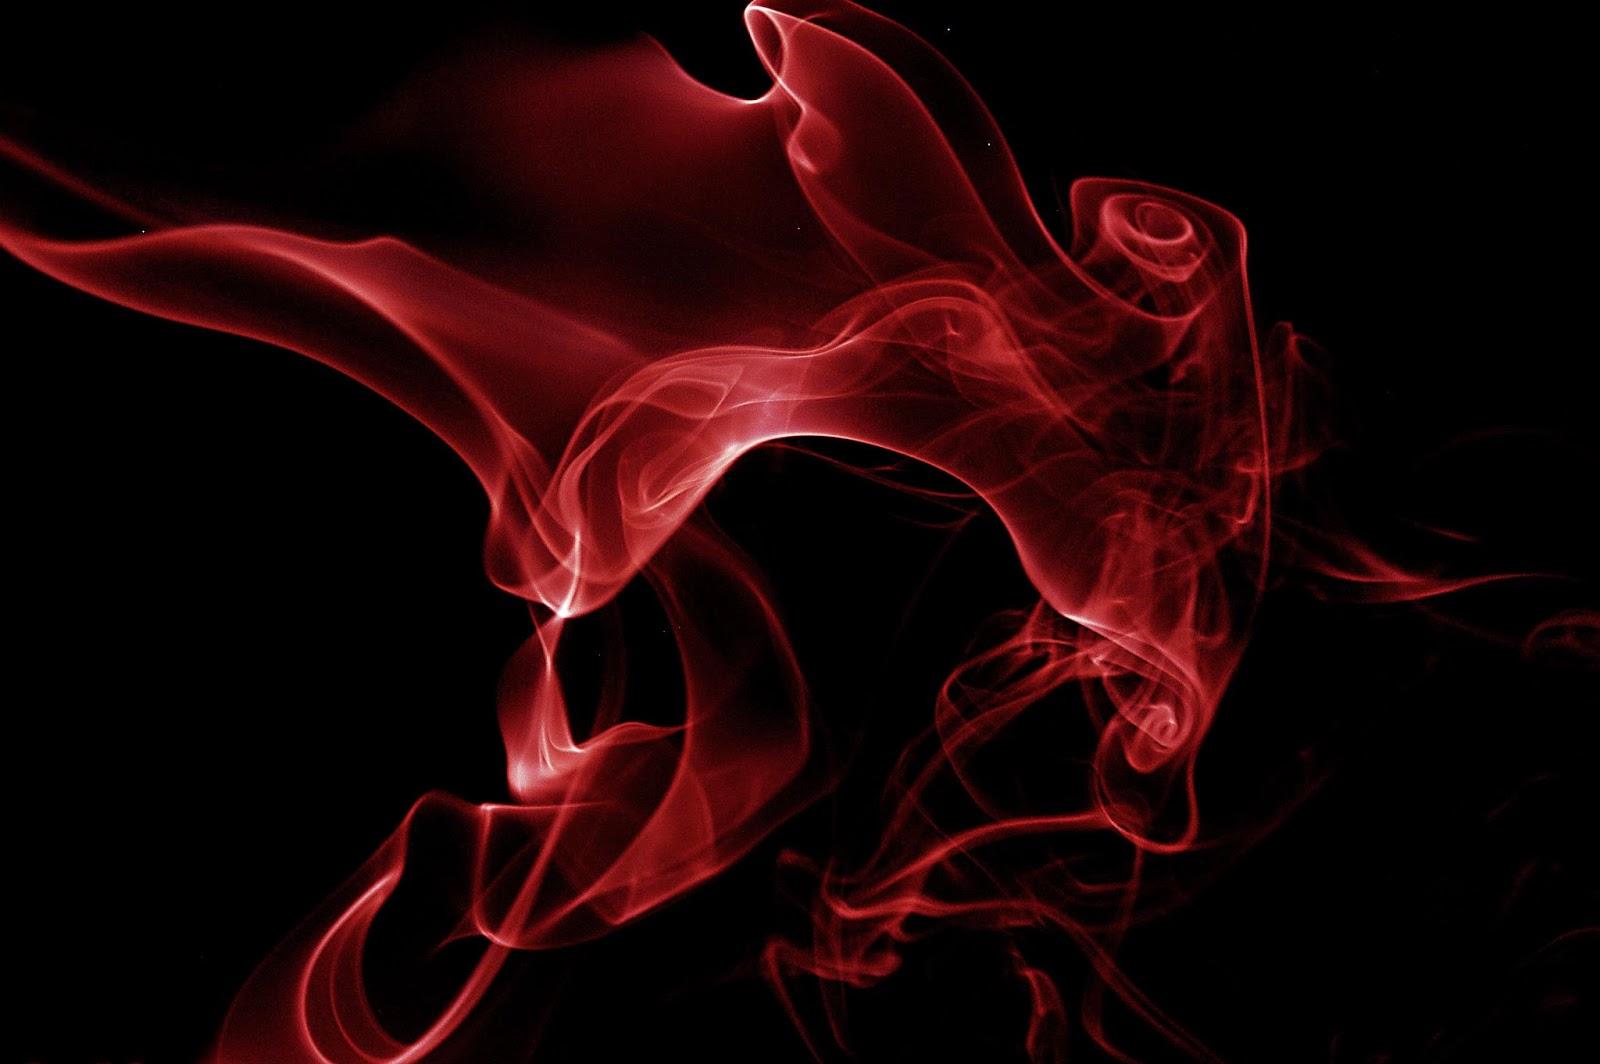 marlboro,humo,tabaco,fumar,marca,imagen,burnett,americano,target,mensaje